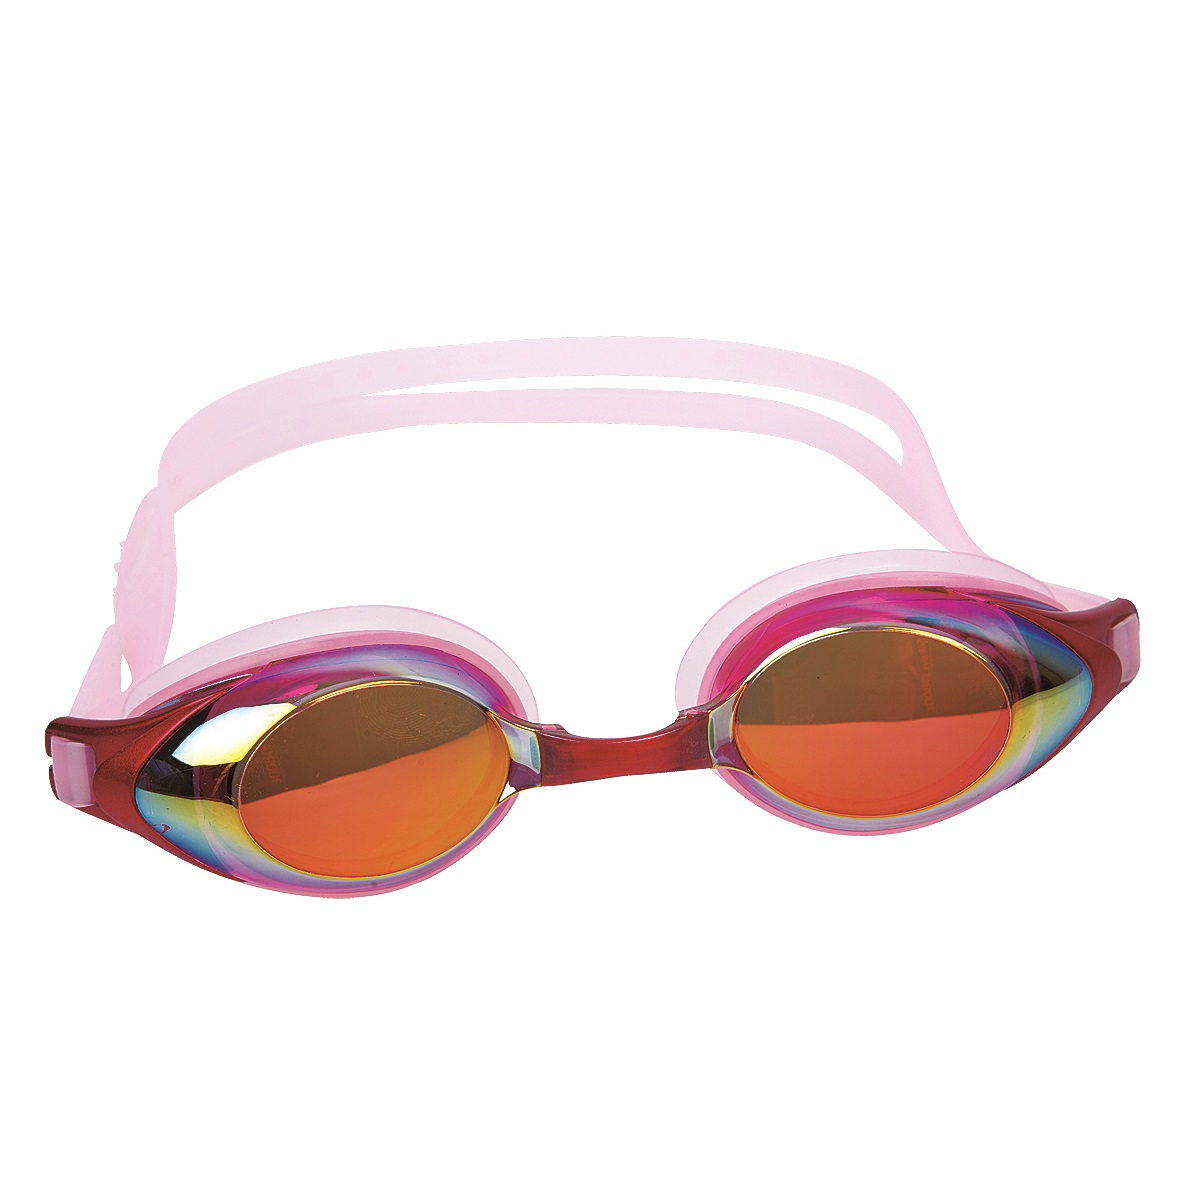 Plavecké brýle Z-Ray 522 - zrcadlové